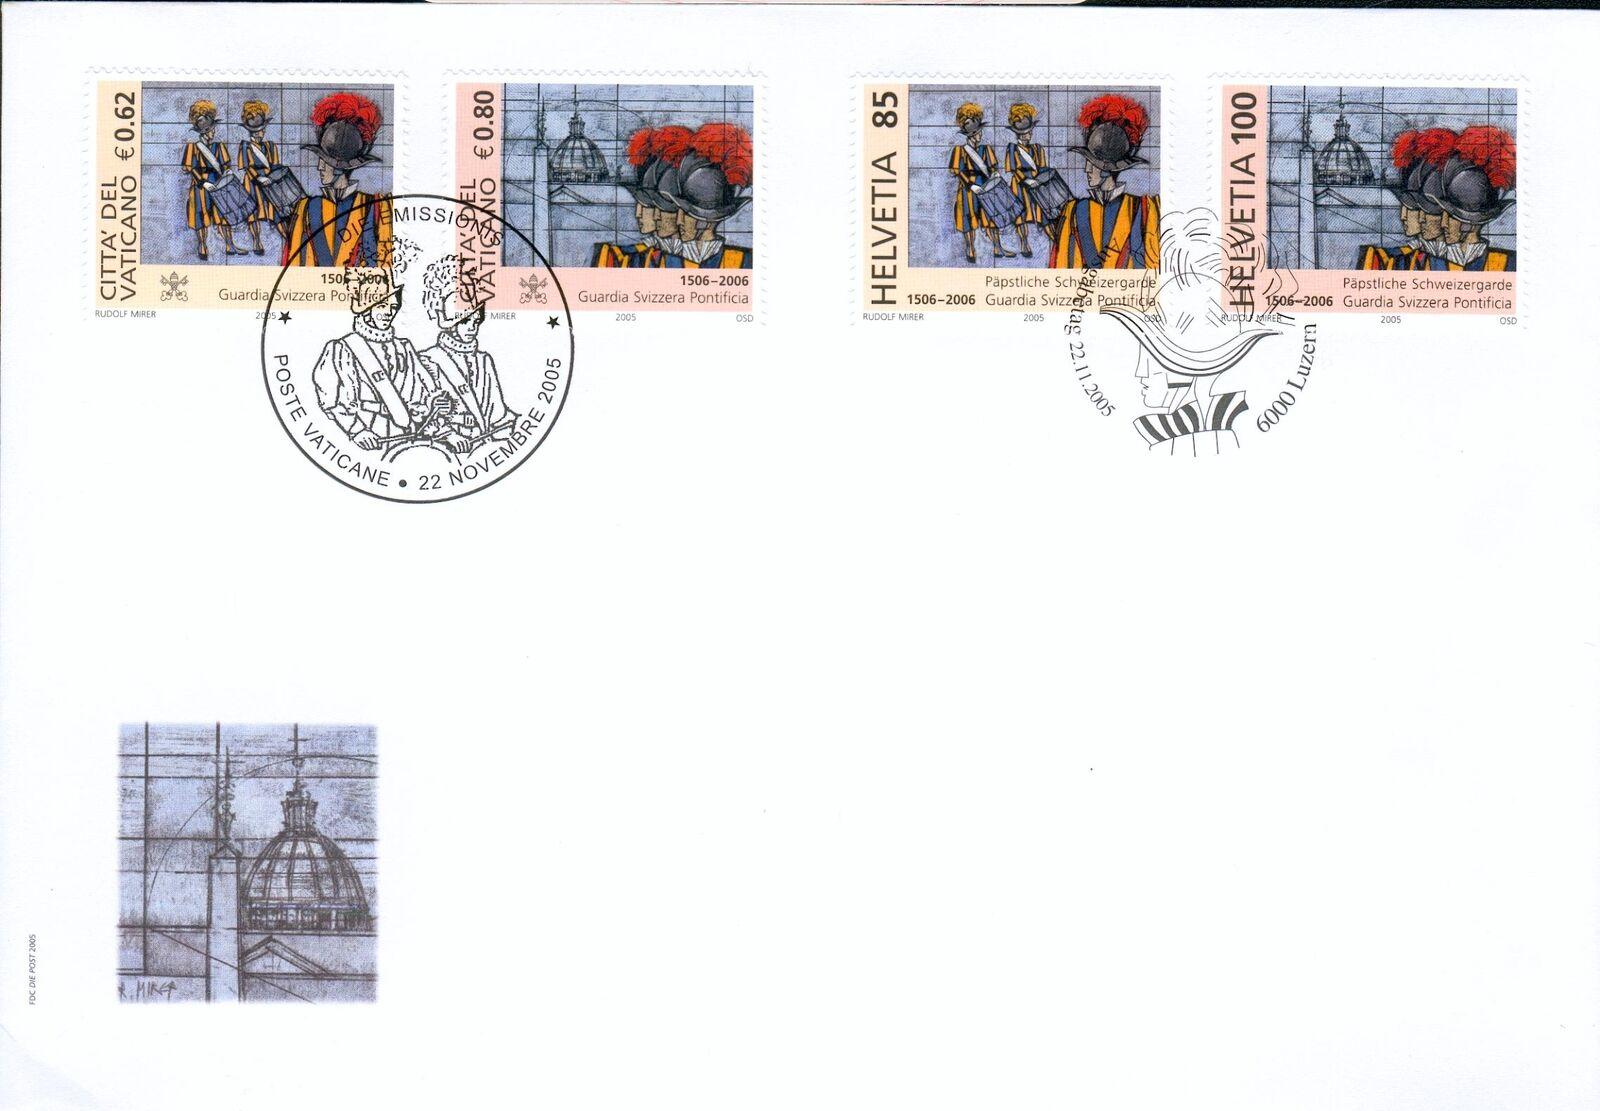 Vatican City - Scott #1315-1316 (2005) and Switzerland - Scott #1224-1225 (2005) first day cover